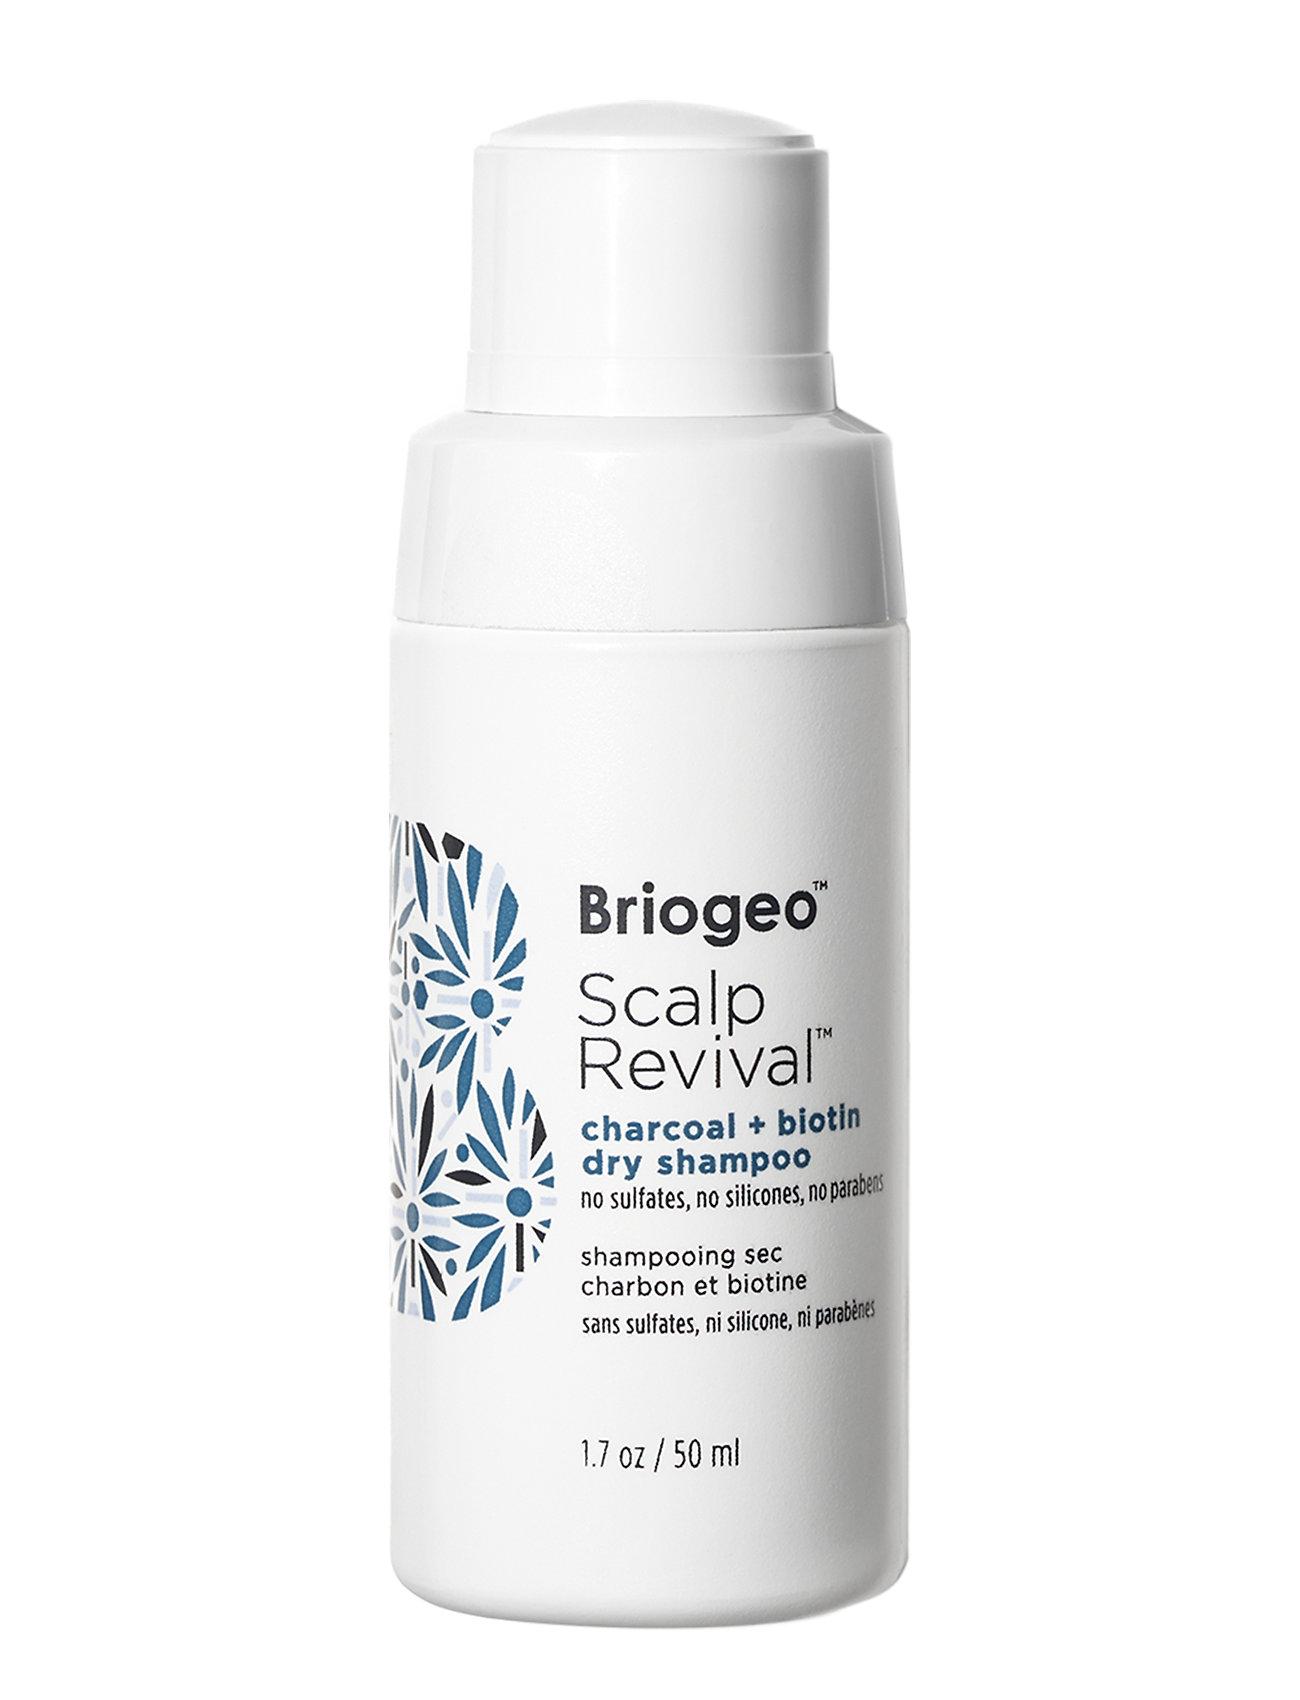 Briogeo Scalp Revival Charcoal + Biotin Dry Shampoo - NO COLOUR